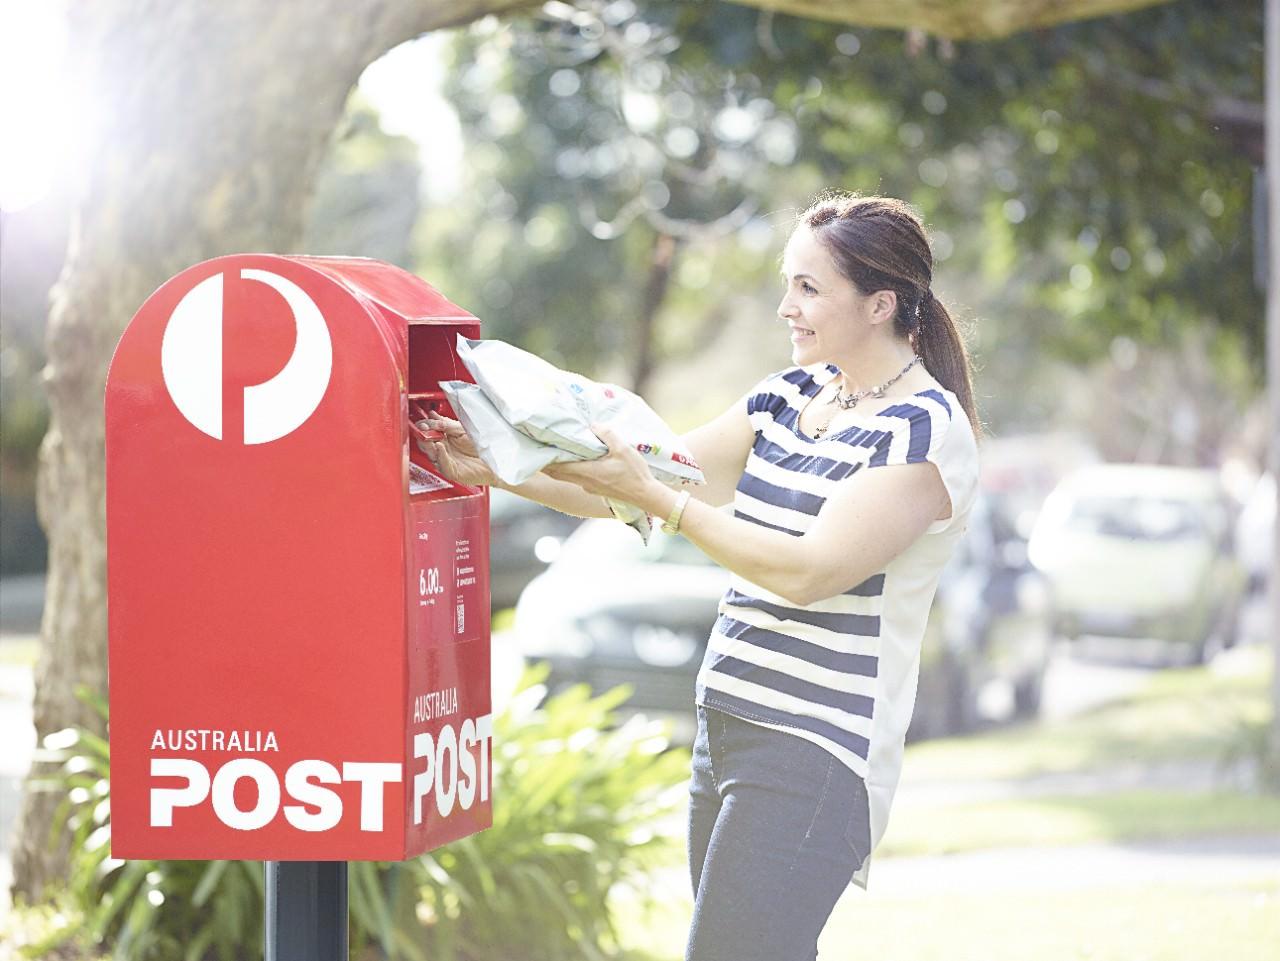 Australia Post satchel